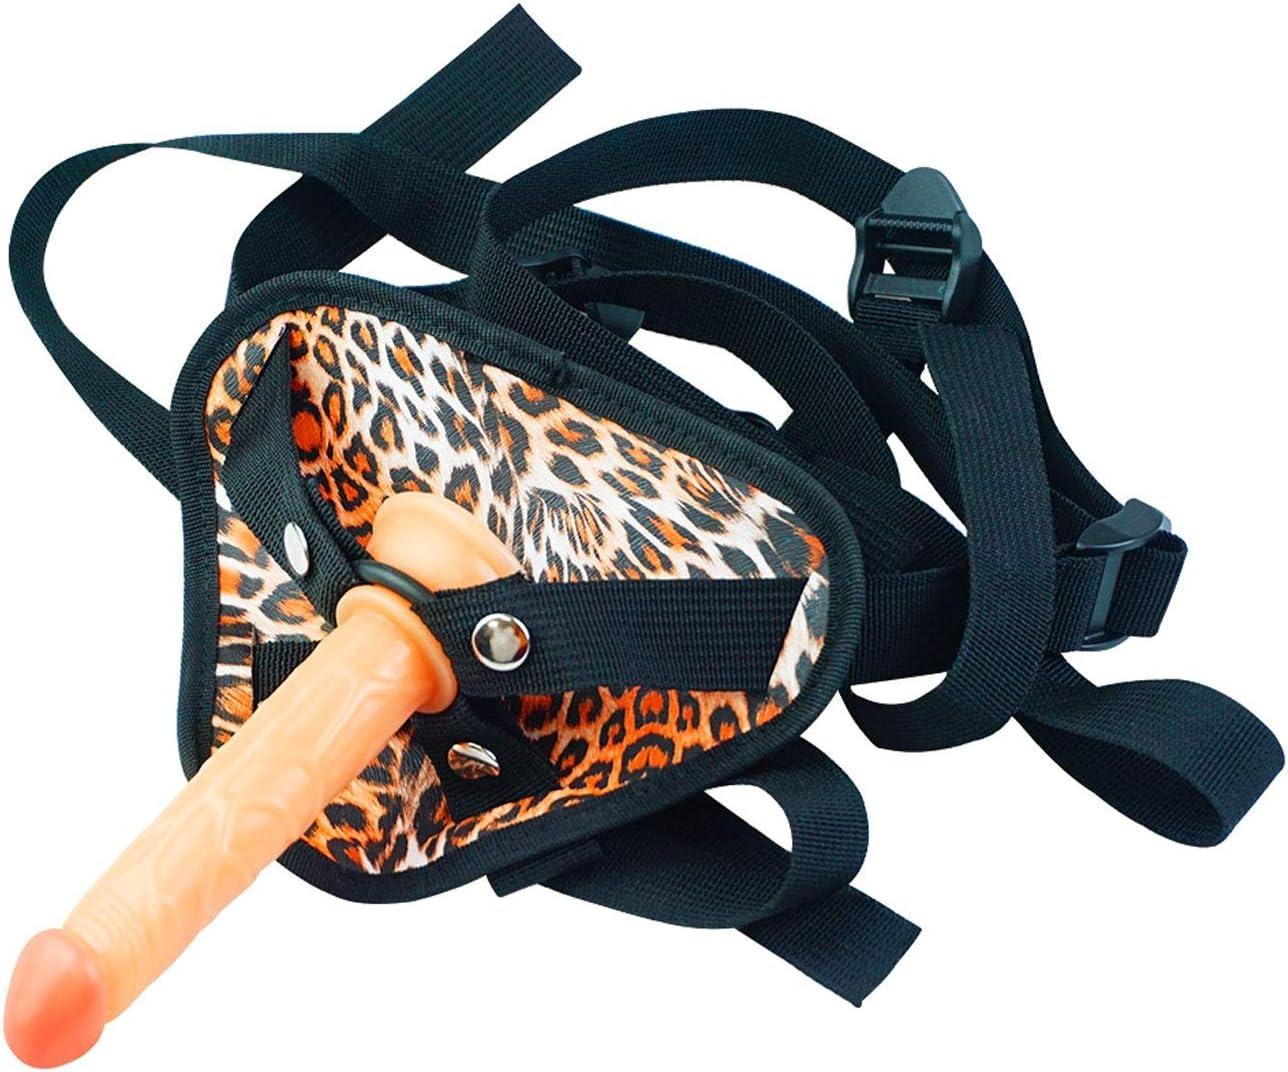 XWU Female 35% OFF Mast urbation Device Leopard Charlotte Mall Detachable 3-Ring Print